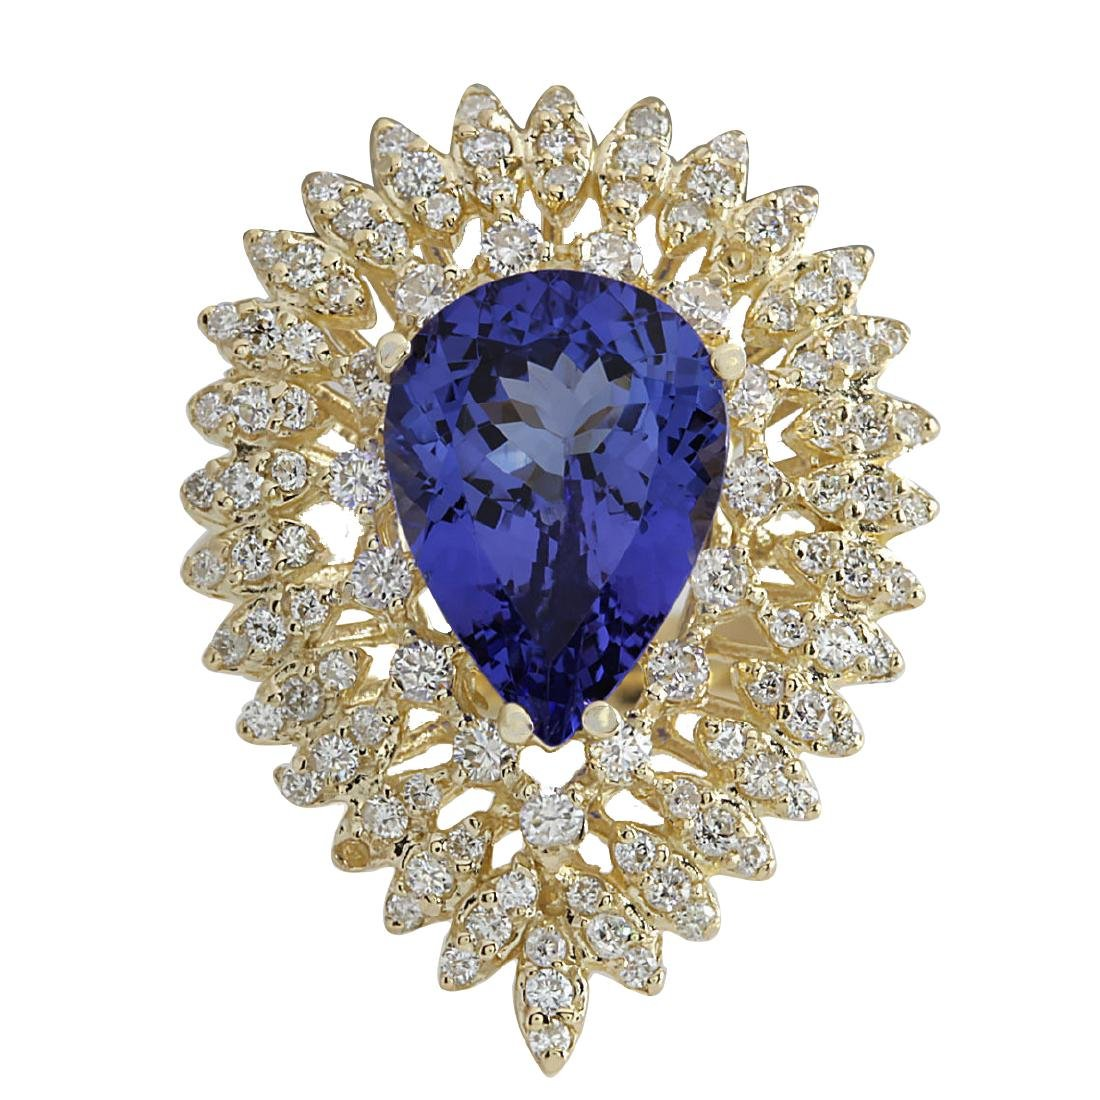 4.85CTW Natural Blue Tanzanite And Diamond Ring 18K